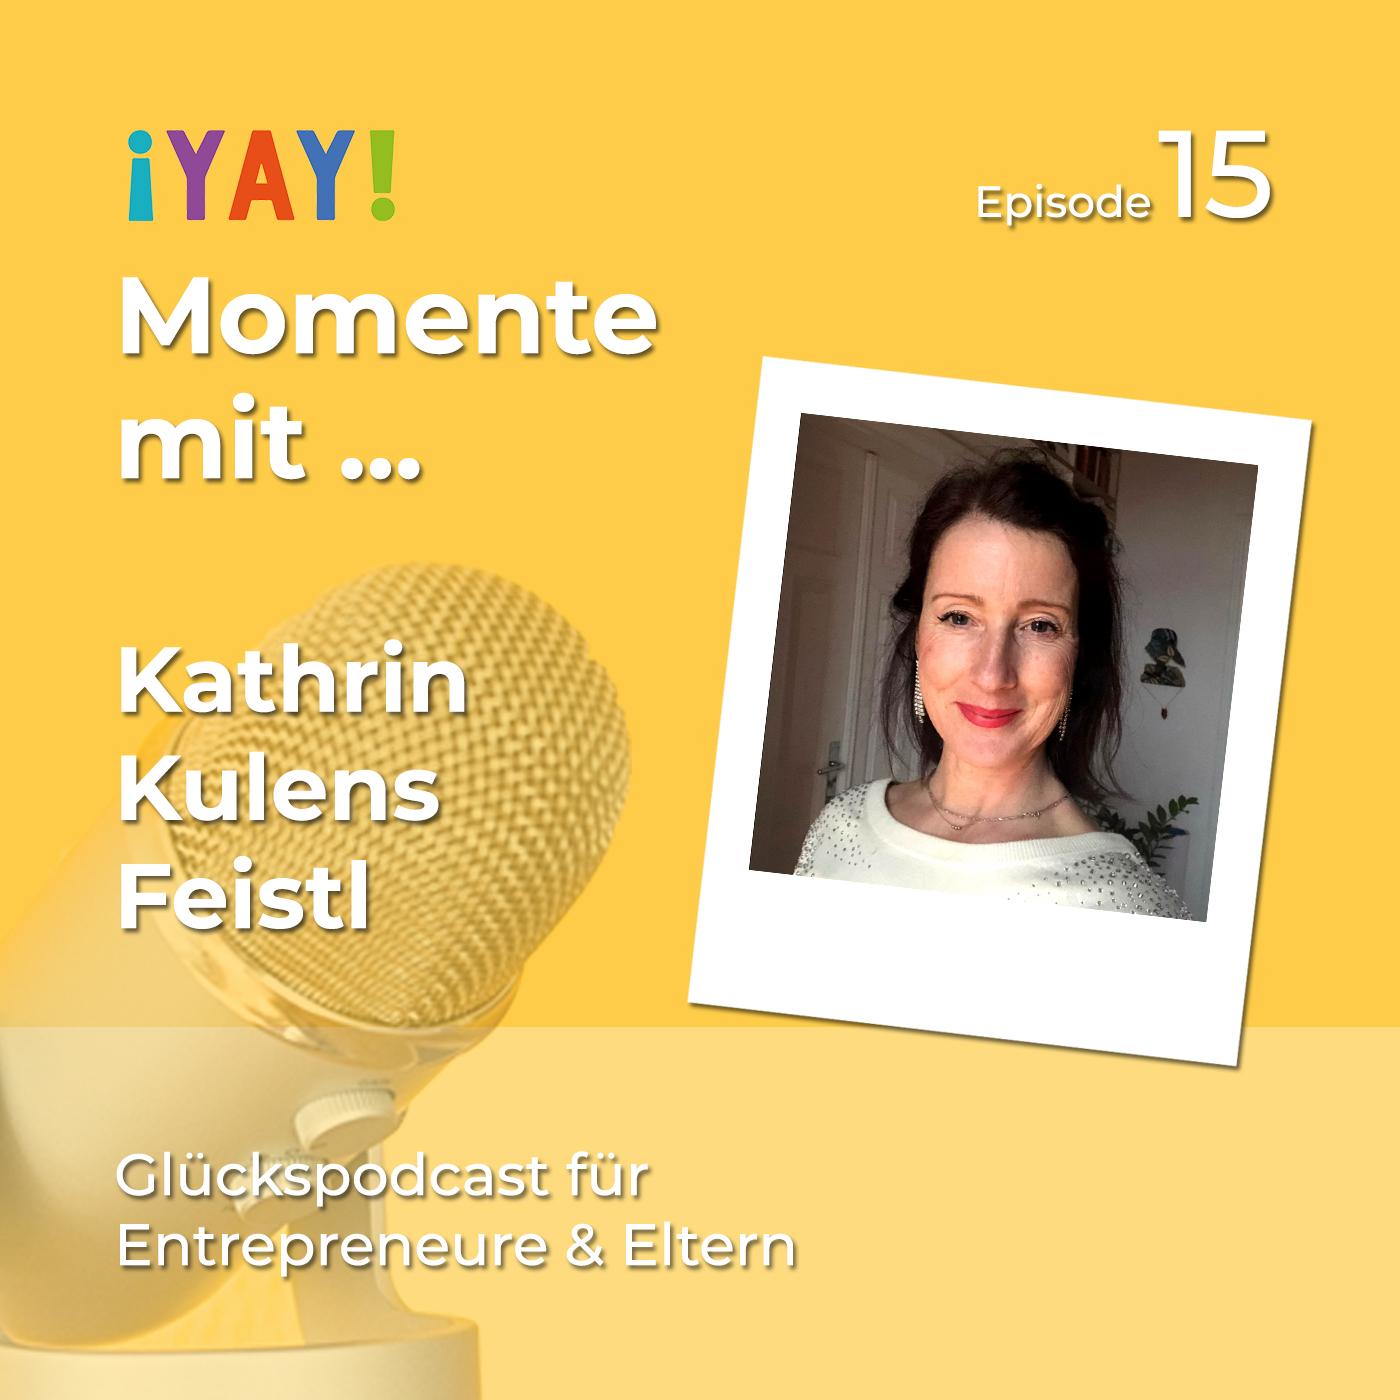 Yay-Momente mit Regisseurin + Storytelling-Trainerin Kathrin Kulens Feistl